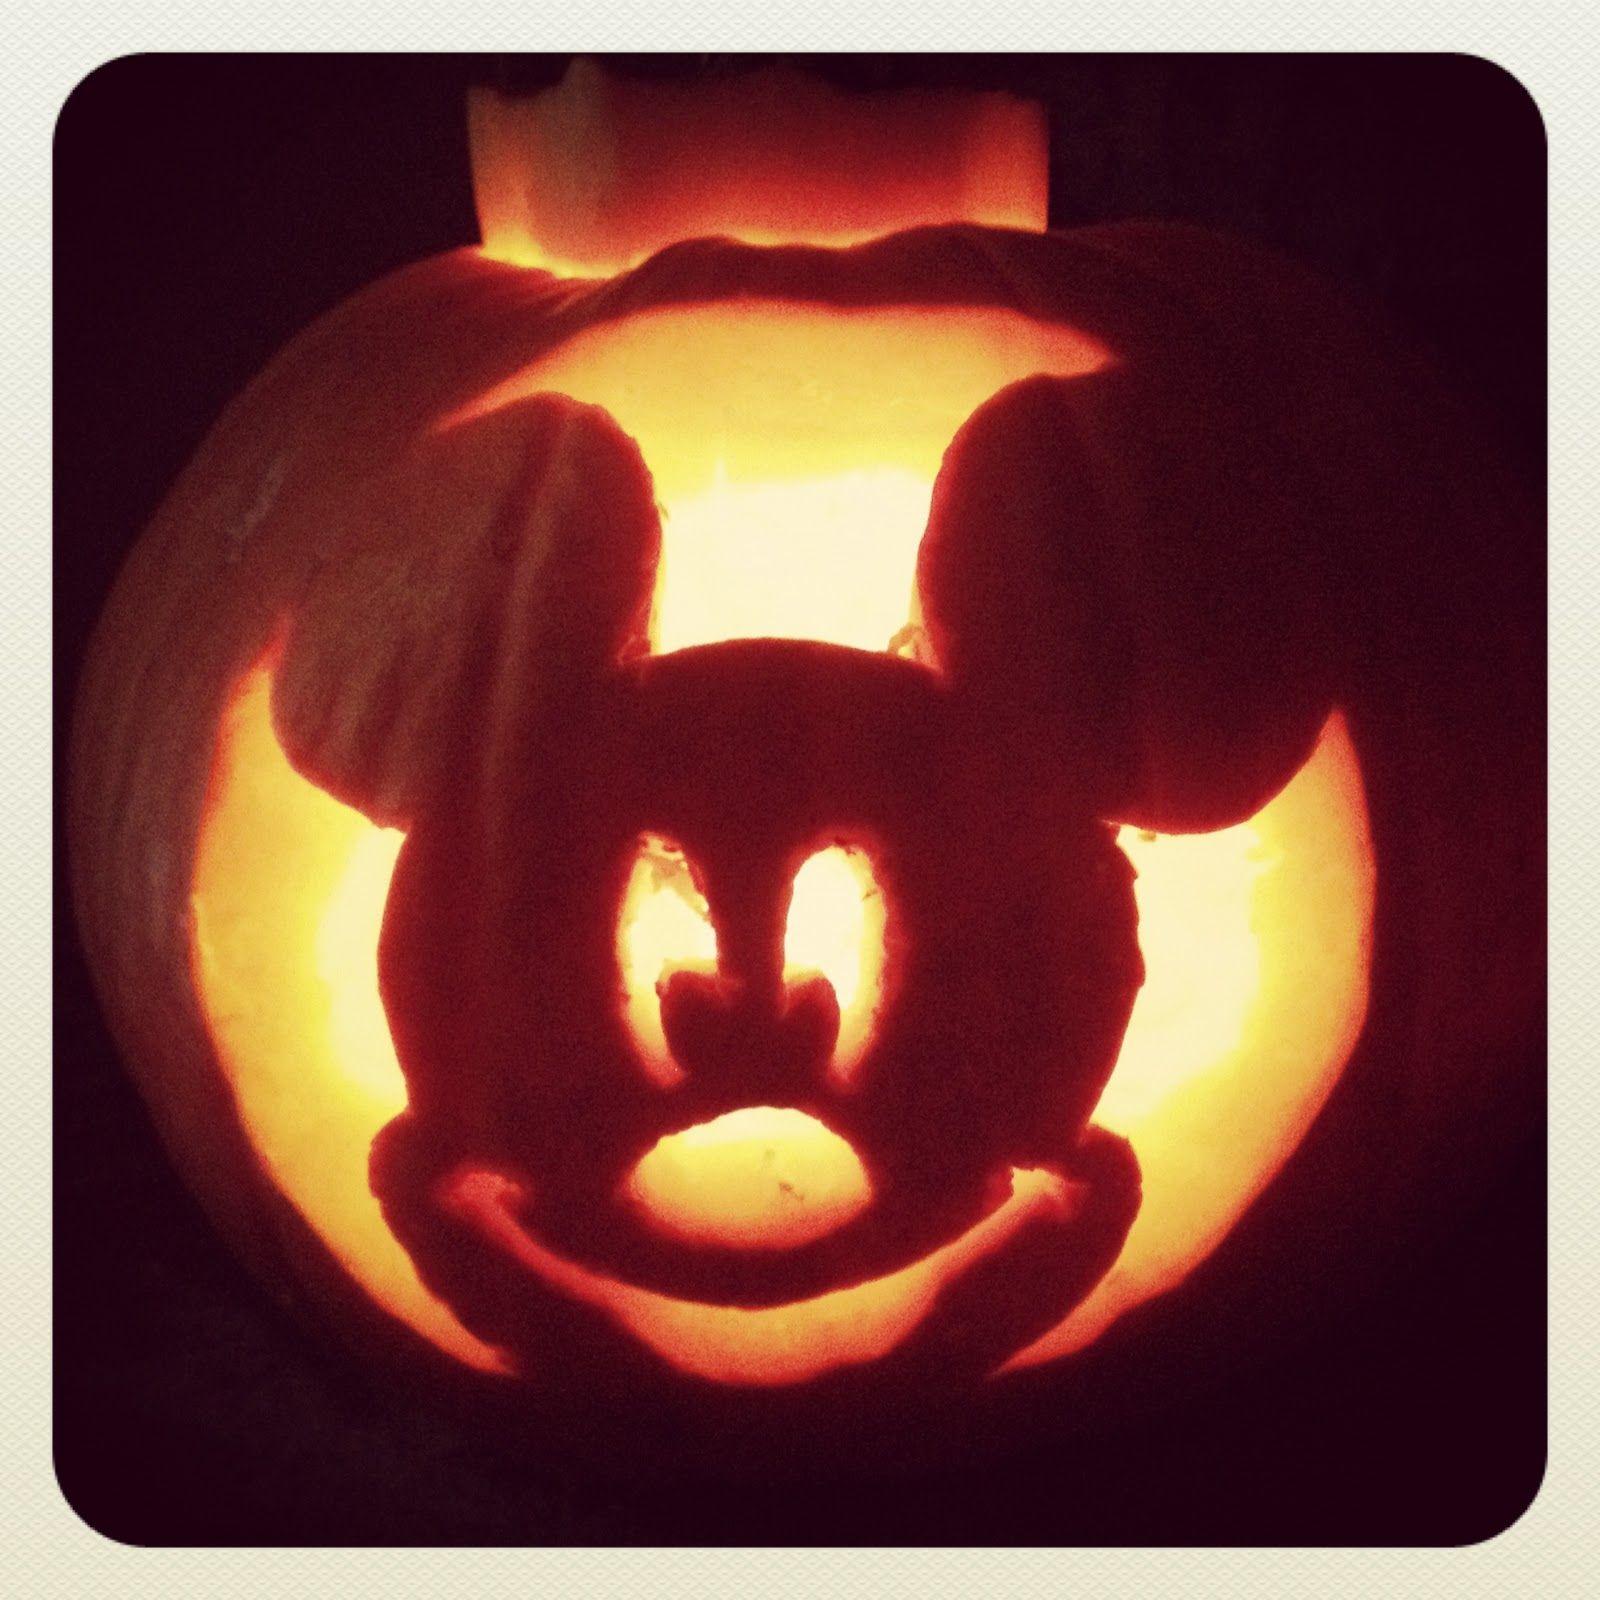 mickey mouse pumpkin template easy  Pin by Cj Martin on Cool Stuff in 6 | Halloween pumpkin ...